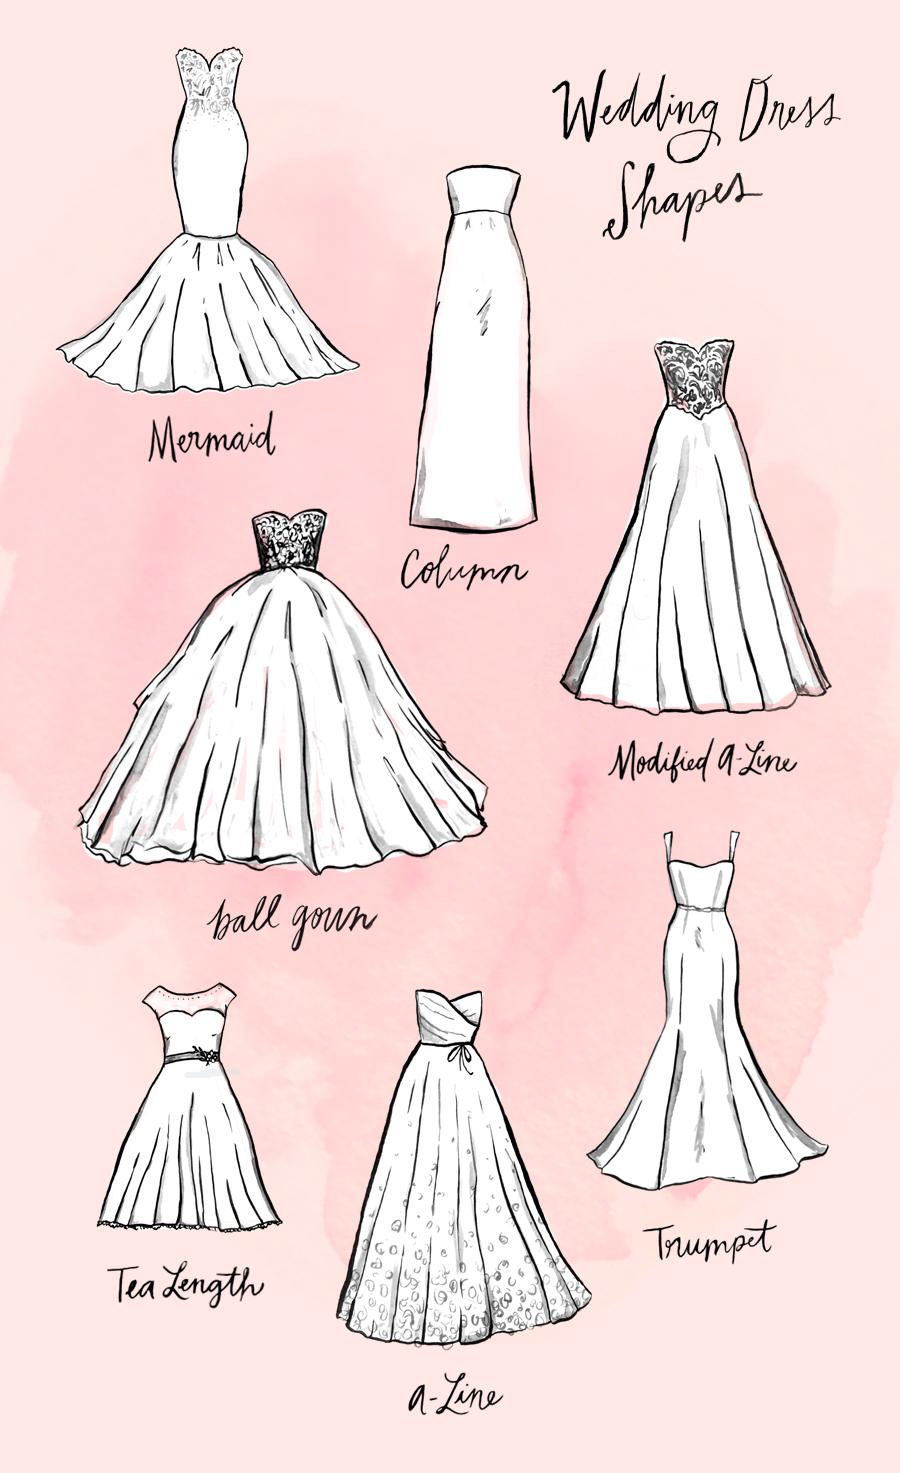 PS_WeddingDresses_Pinterest.jpg